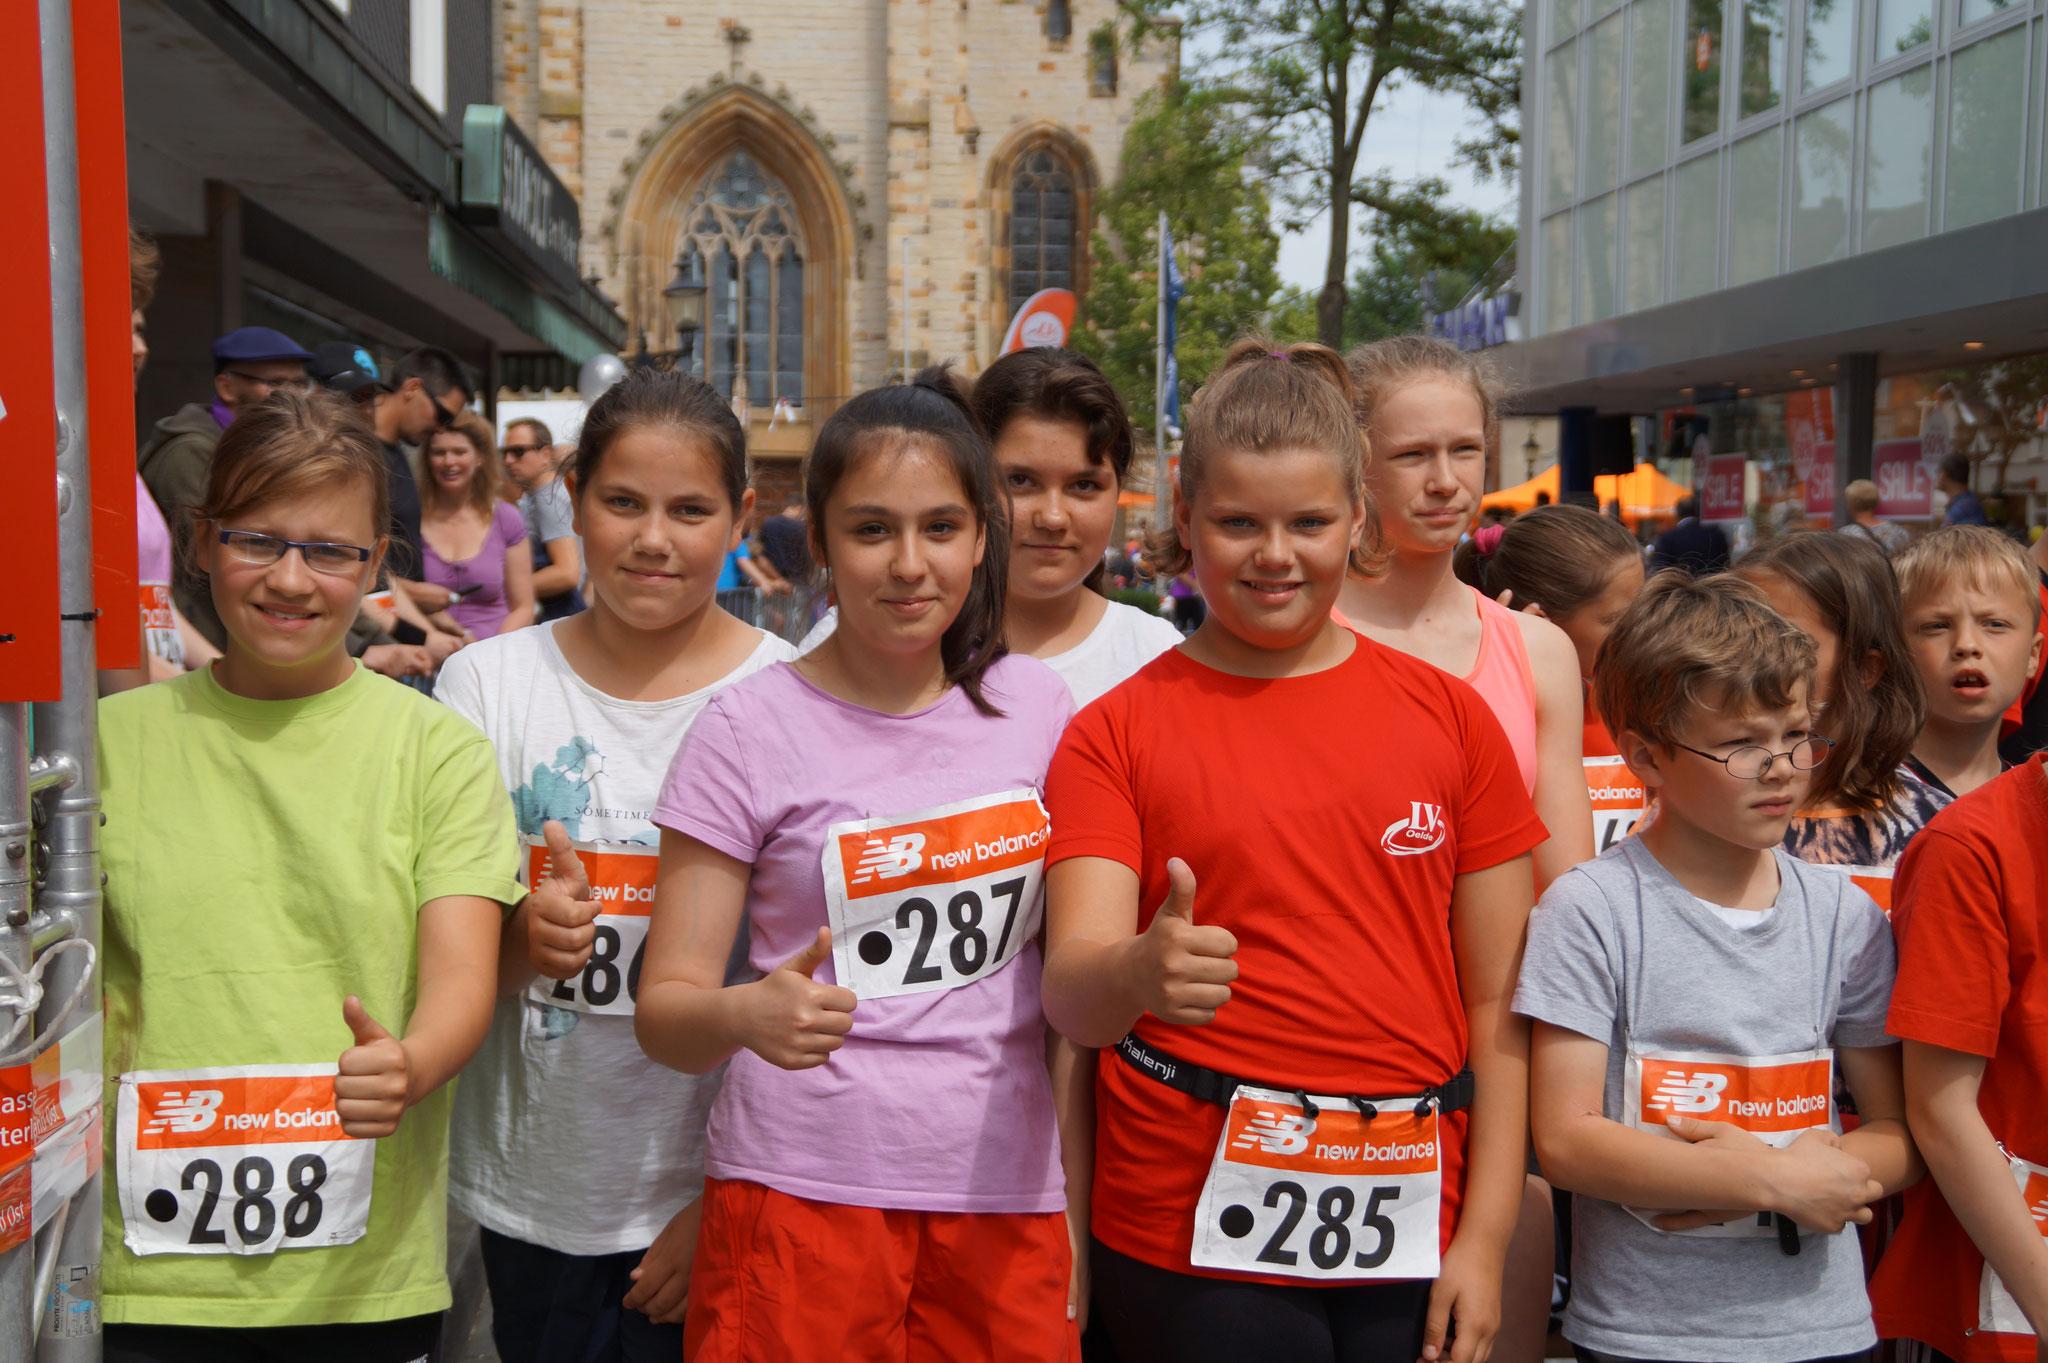 Laura, Isabel, Ece, Sara, Henrike - Start vor den 1500m